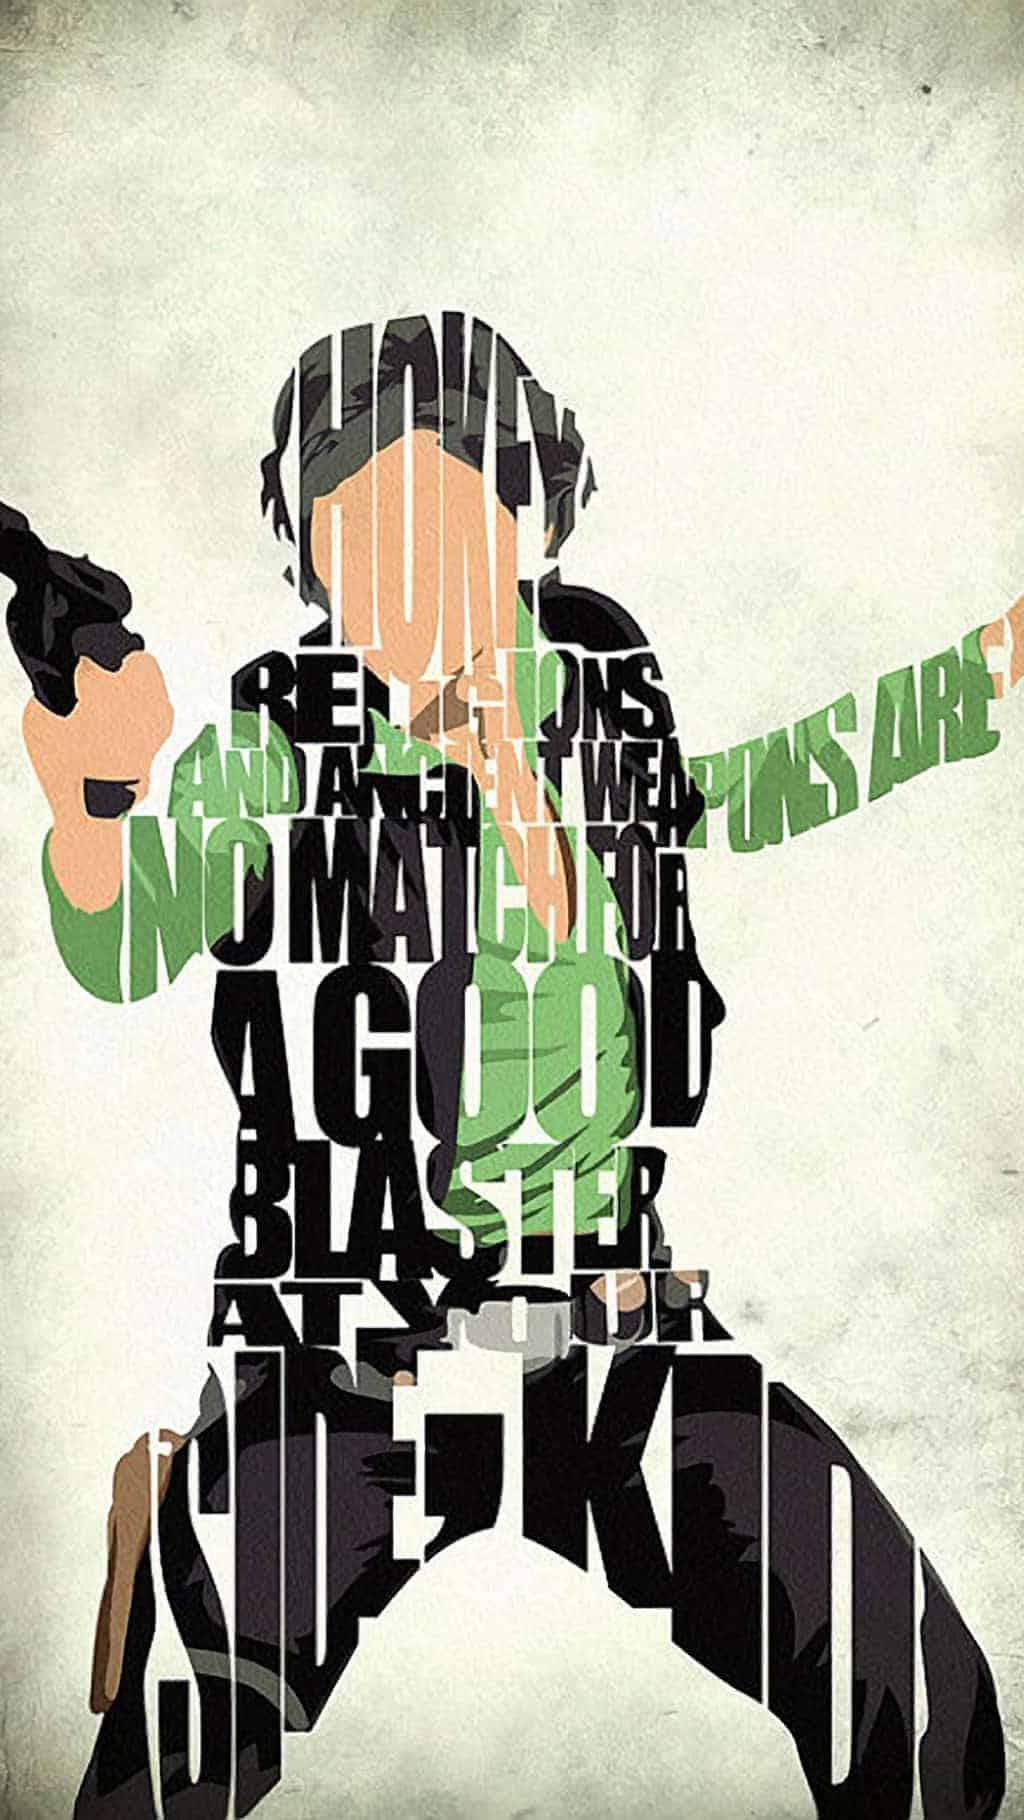 Han Solo Typography Wallpaper iphone